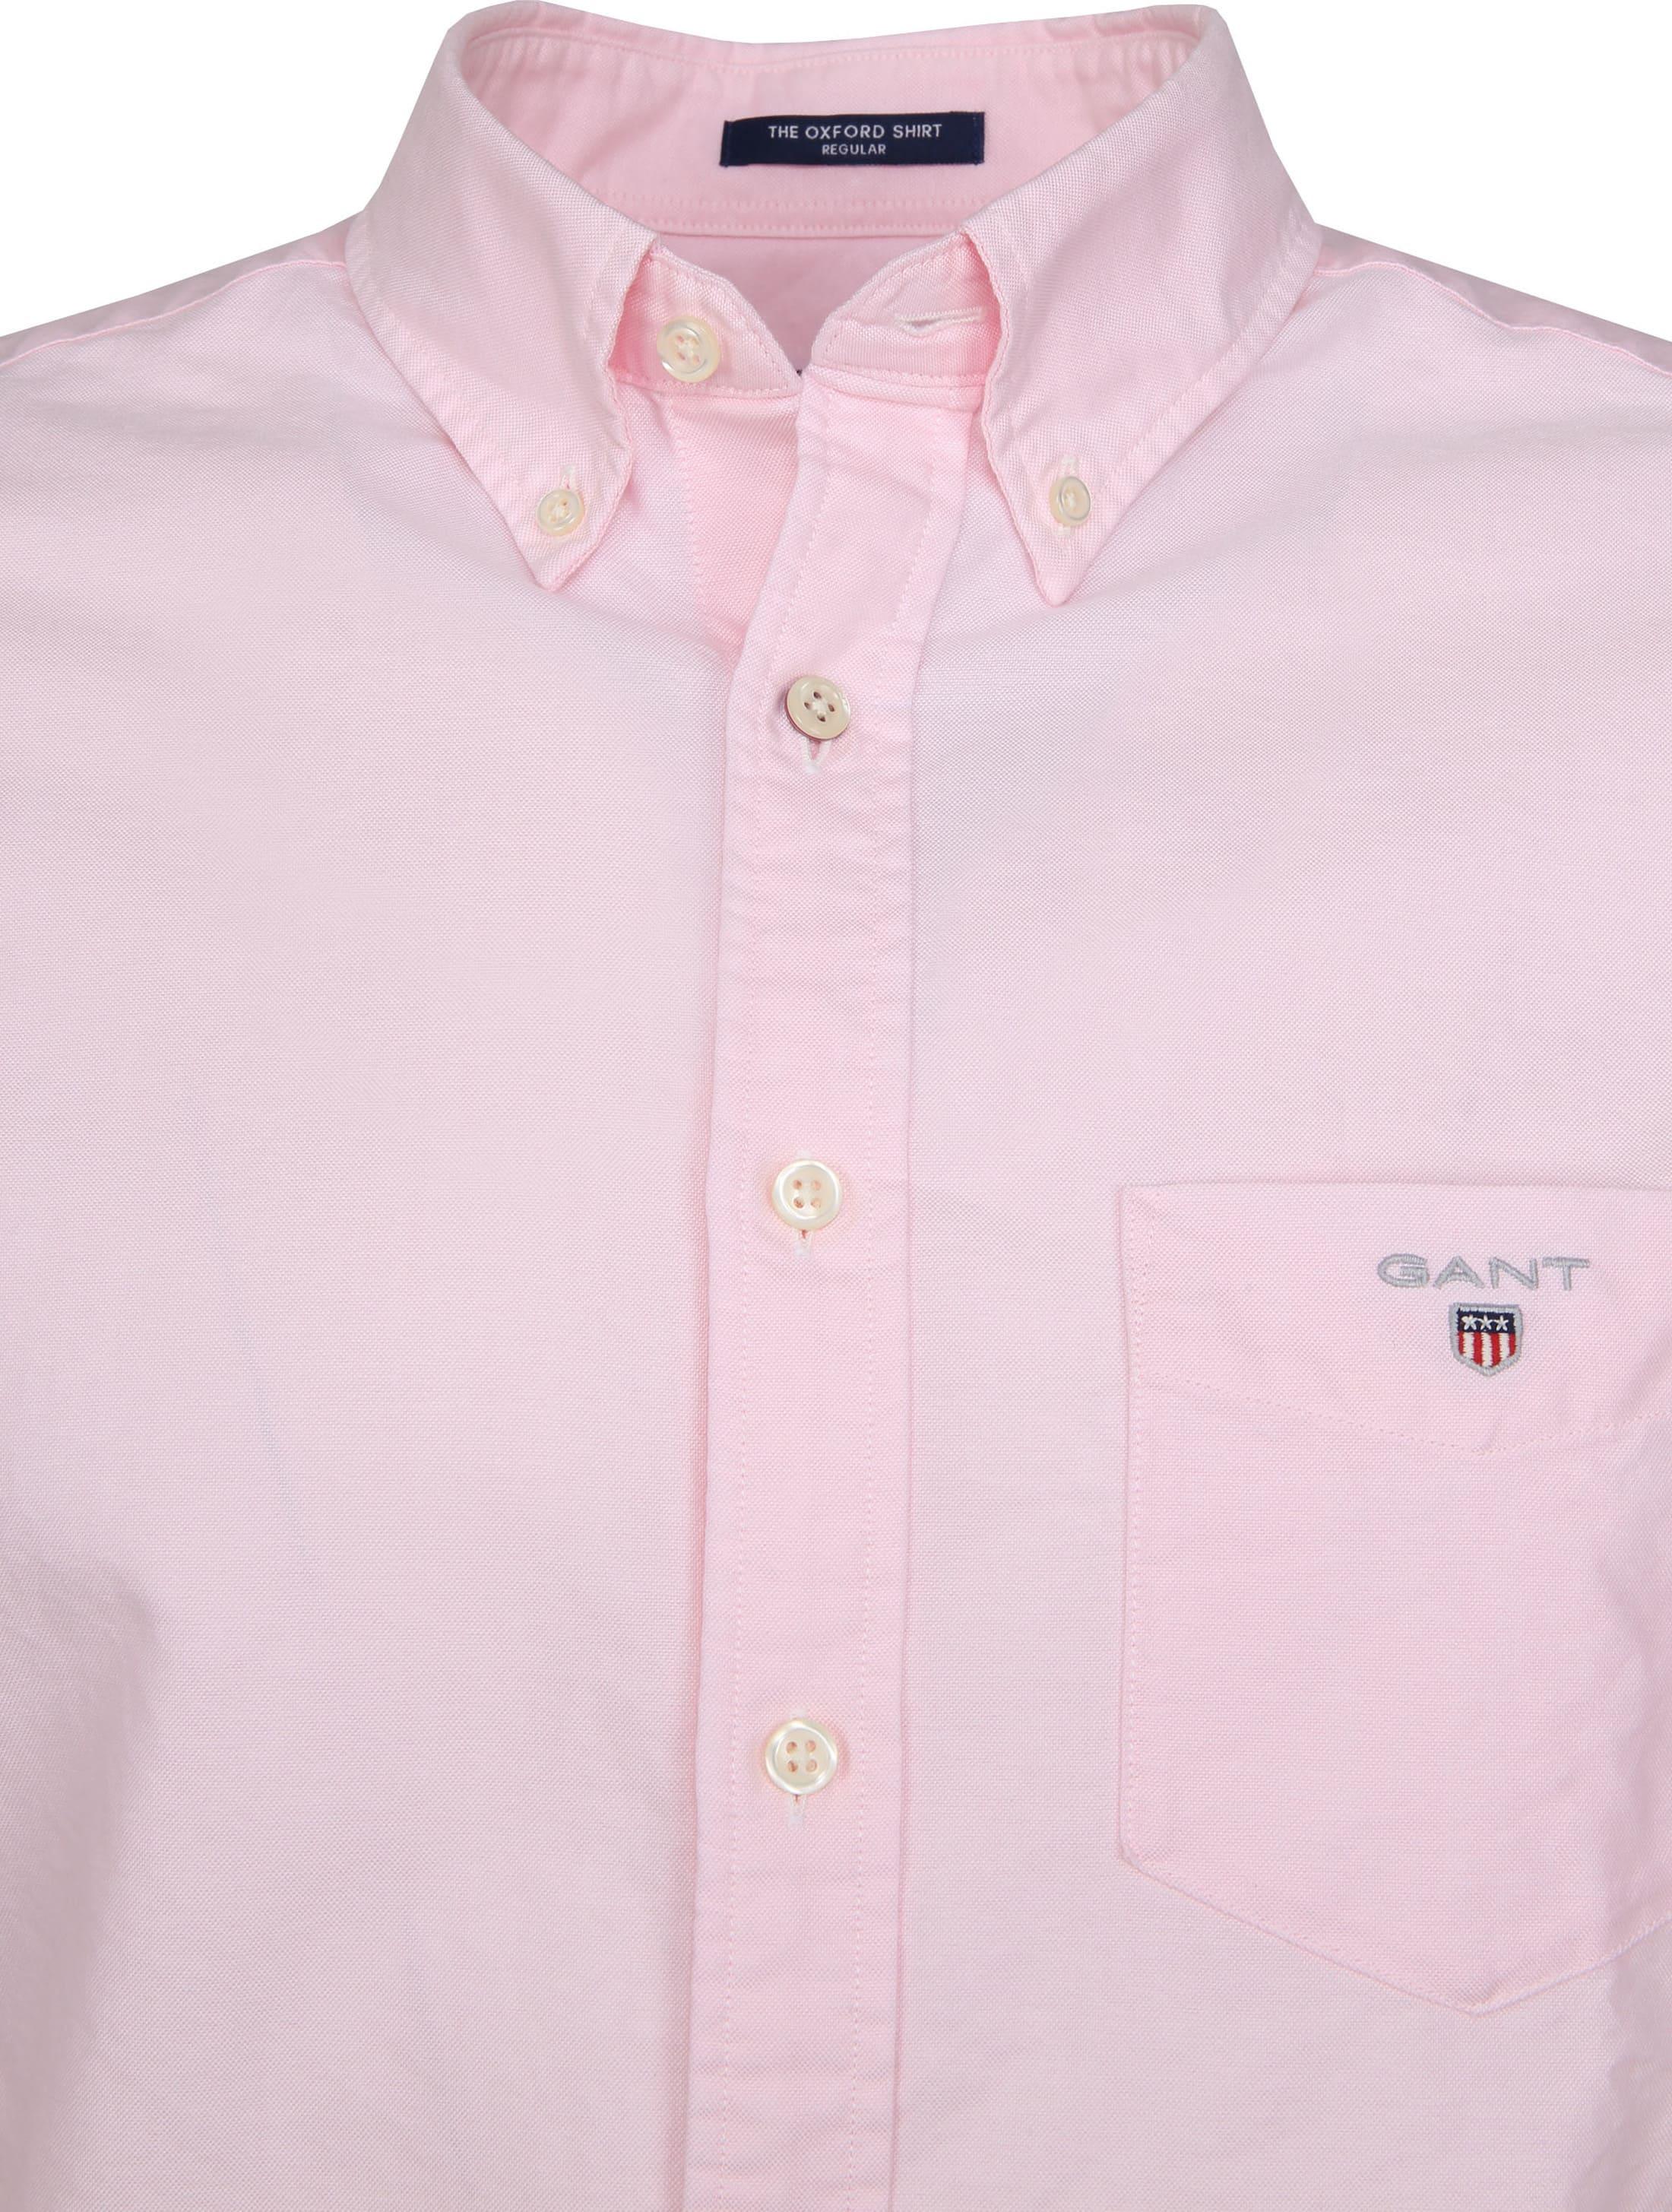 Gant Casual Overhemd Oxford Roze foto 2